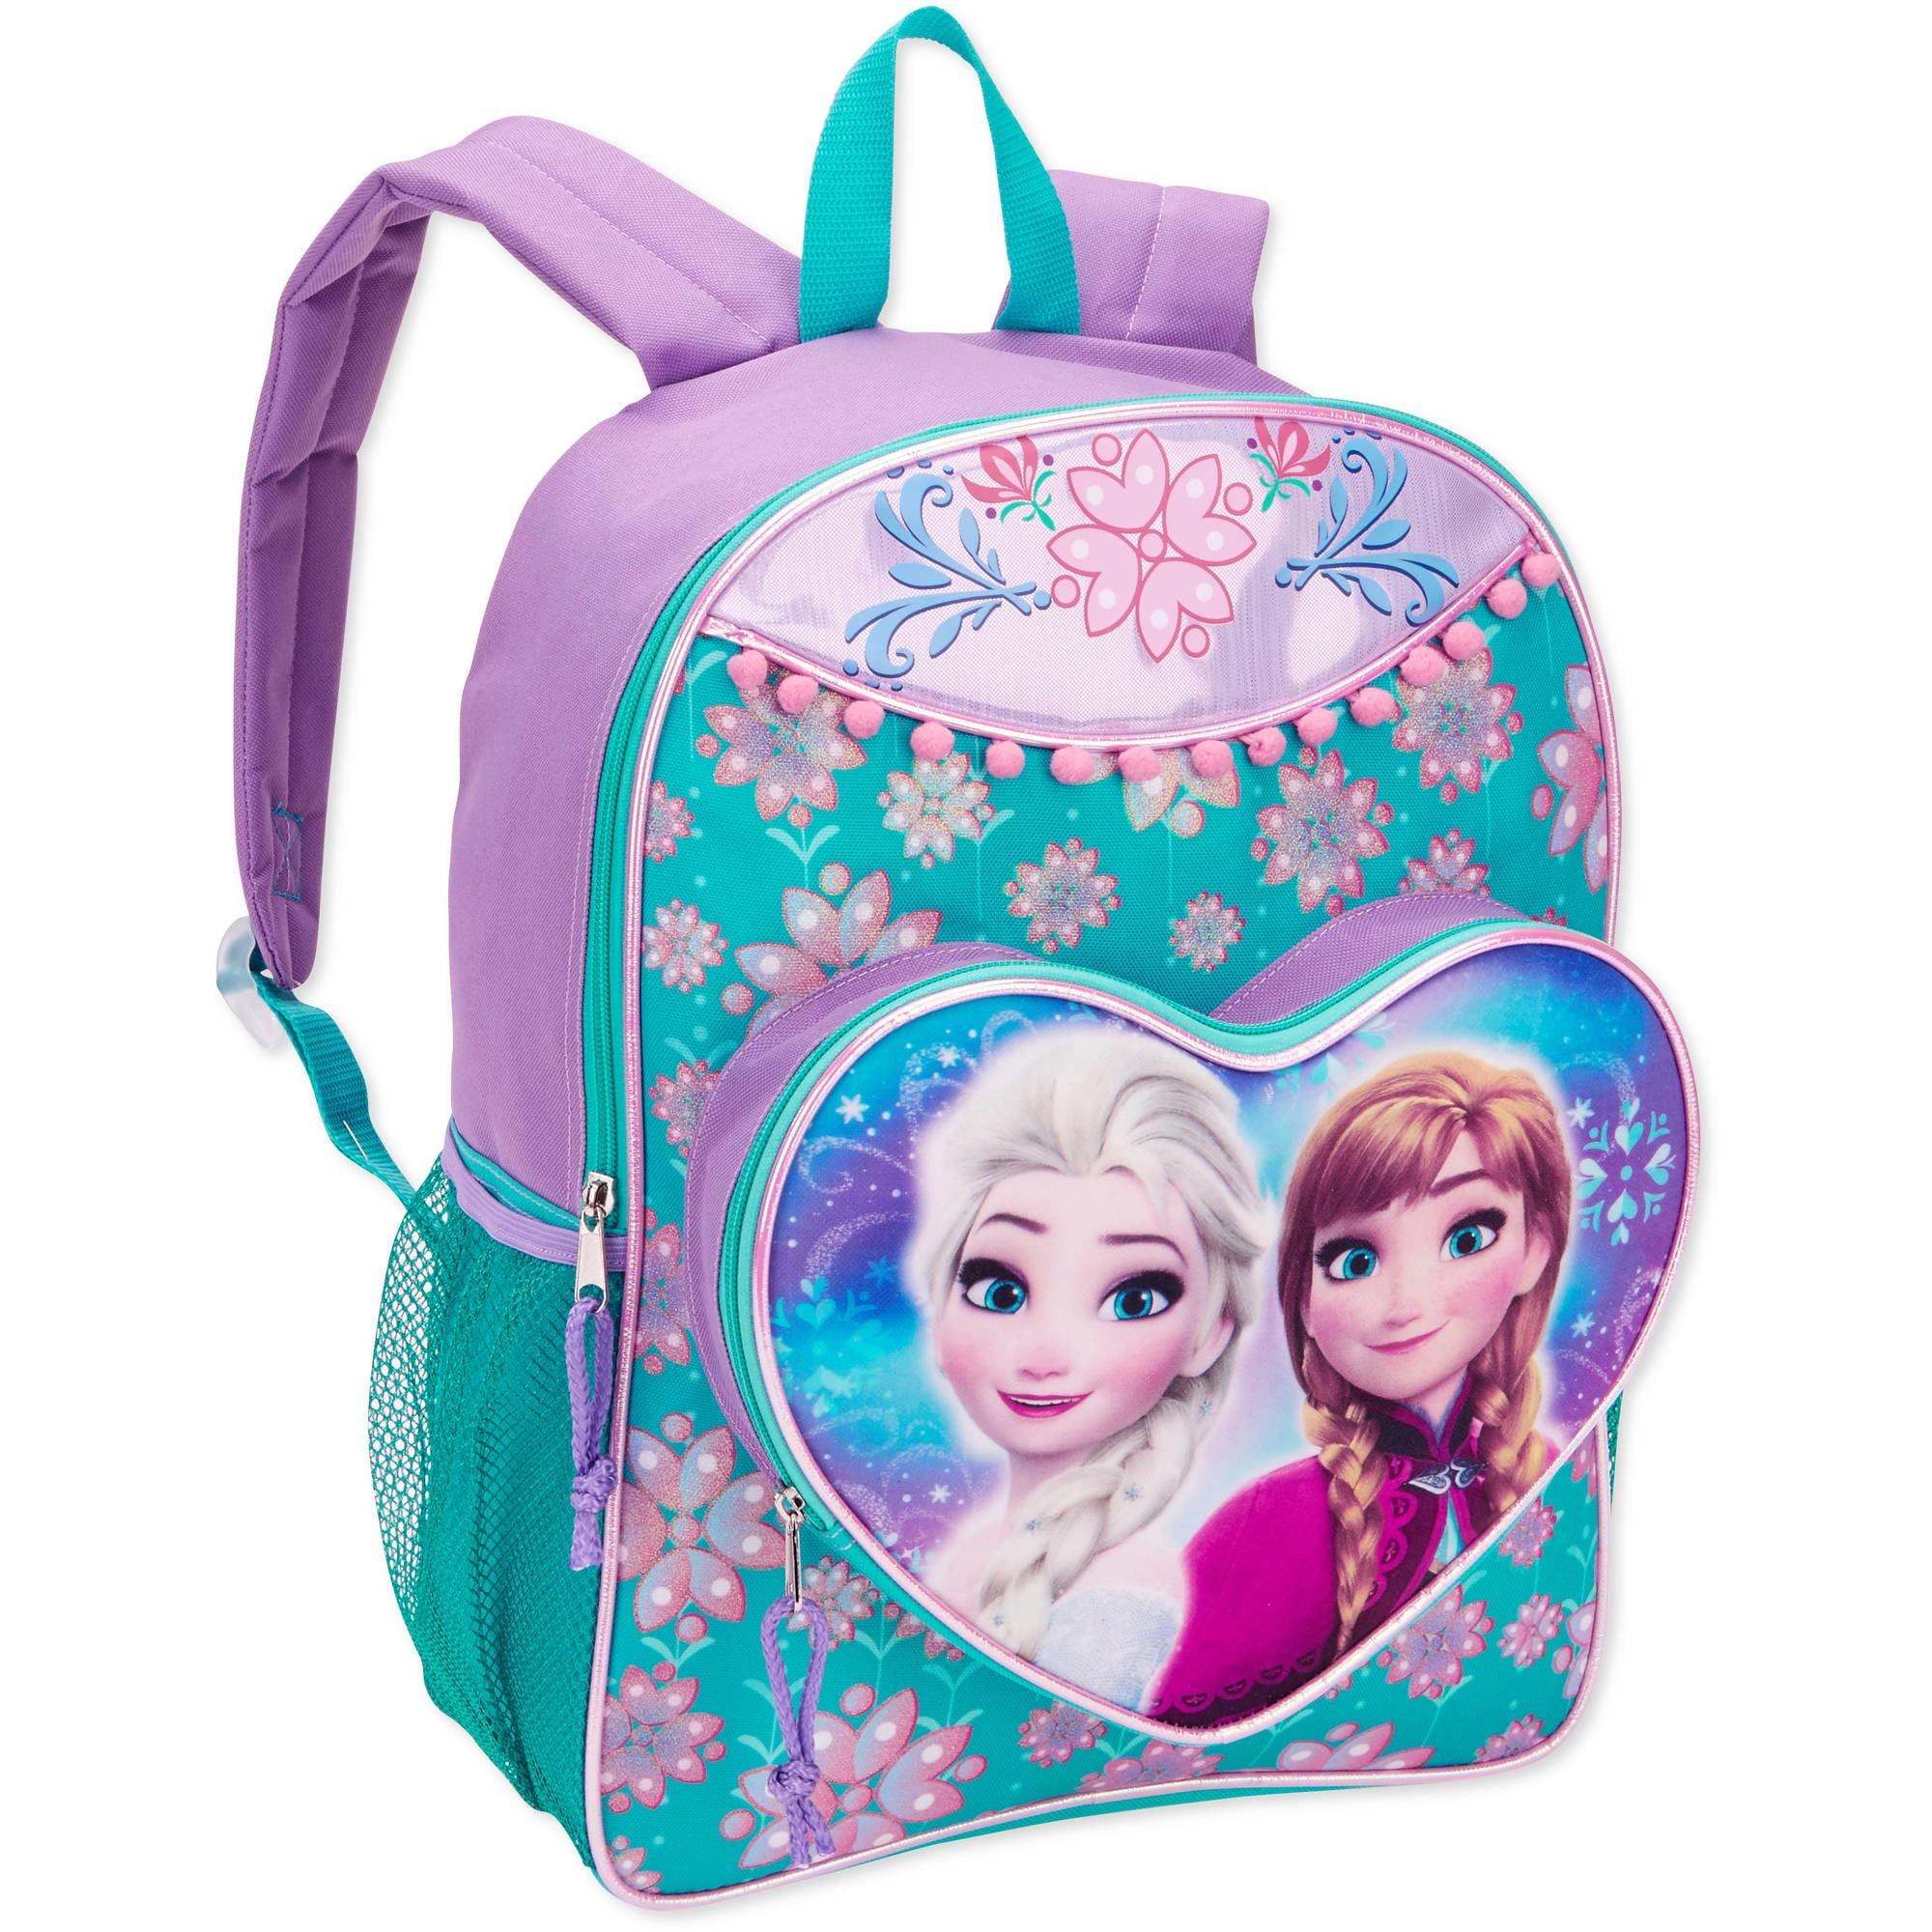 Disney Frozen Anna and Elsa Full Size 16 Inch Kids Backpack